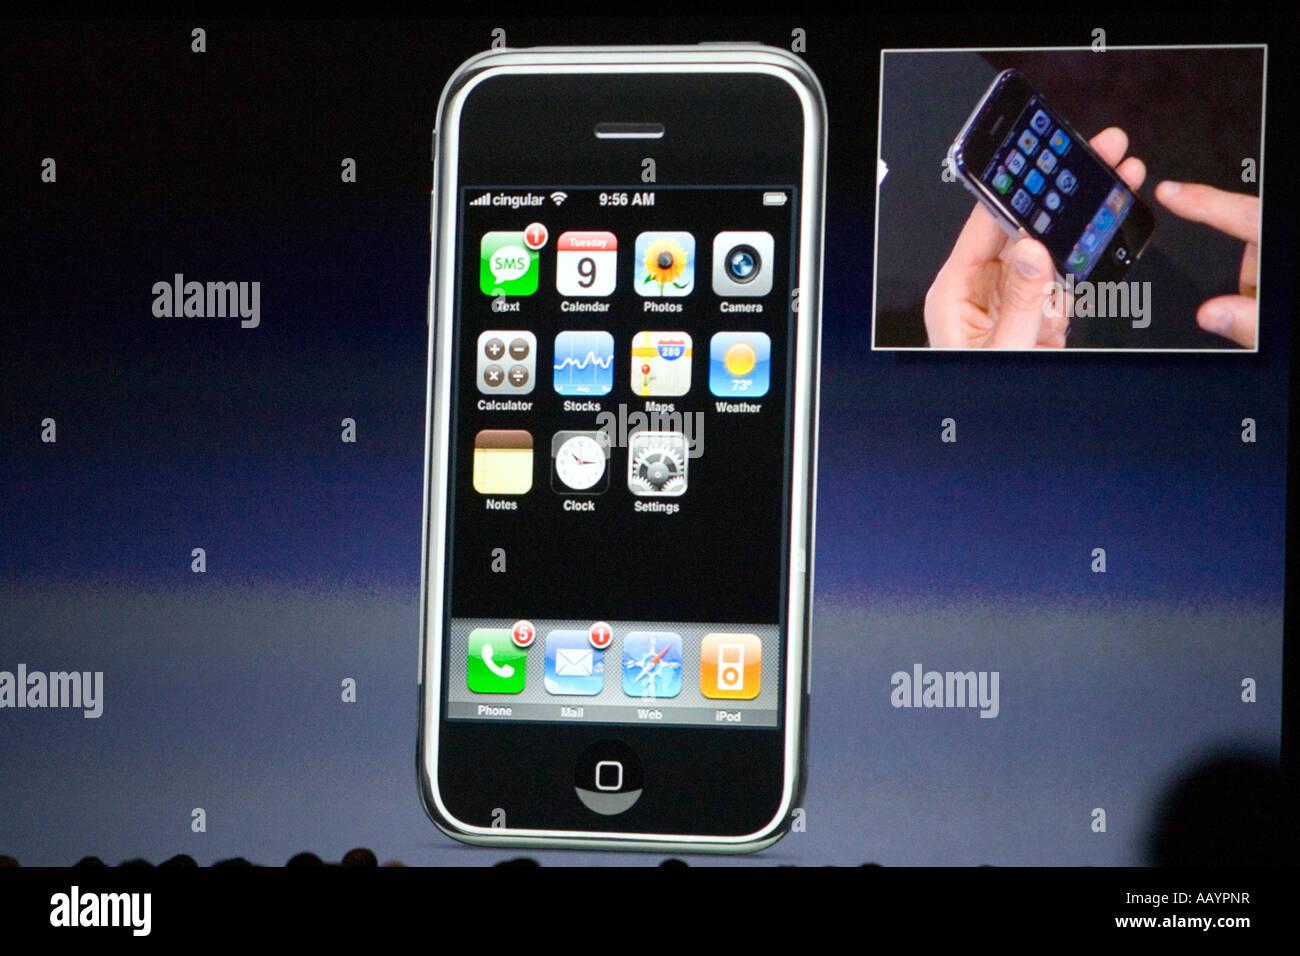 Steve Jobs iPhone Keynote speech on Tuesday January 9 2007 - Stock Image